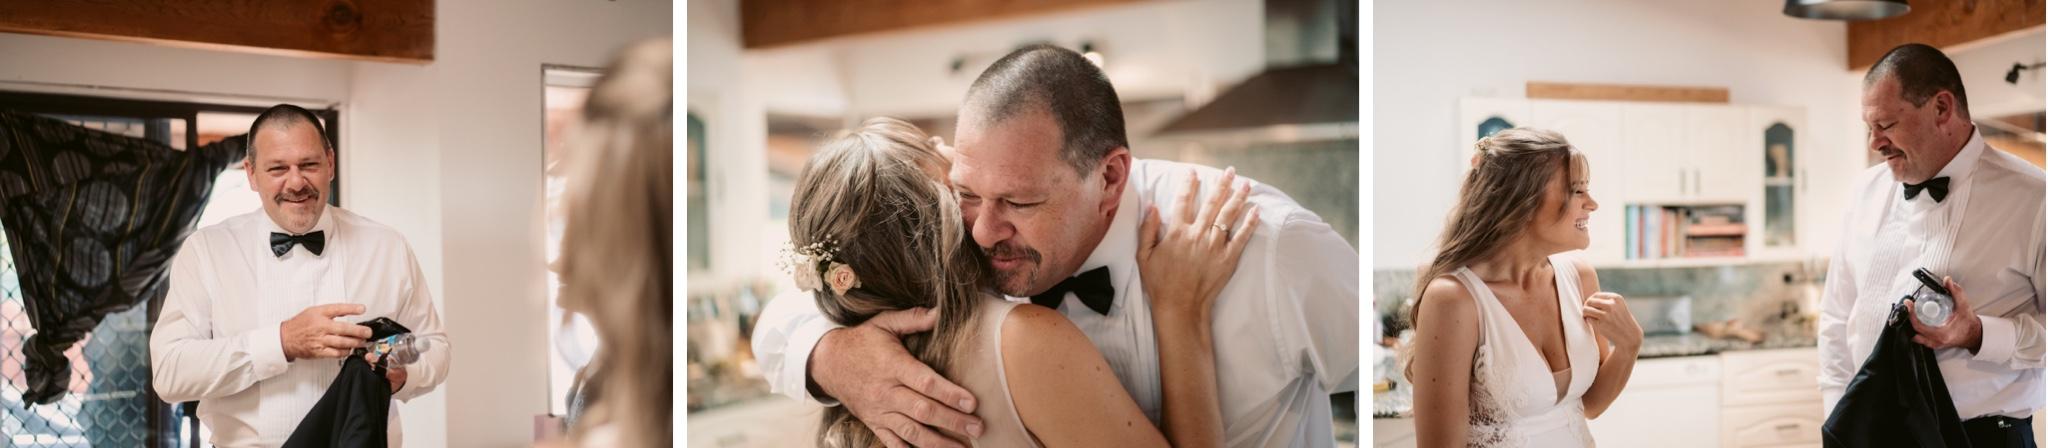 Mornington Peninsula Wedding Photography26.jpg